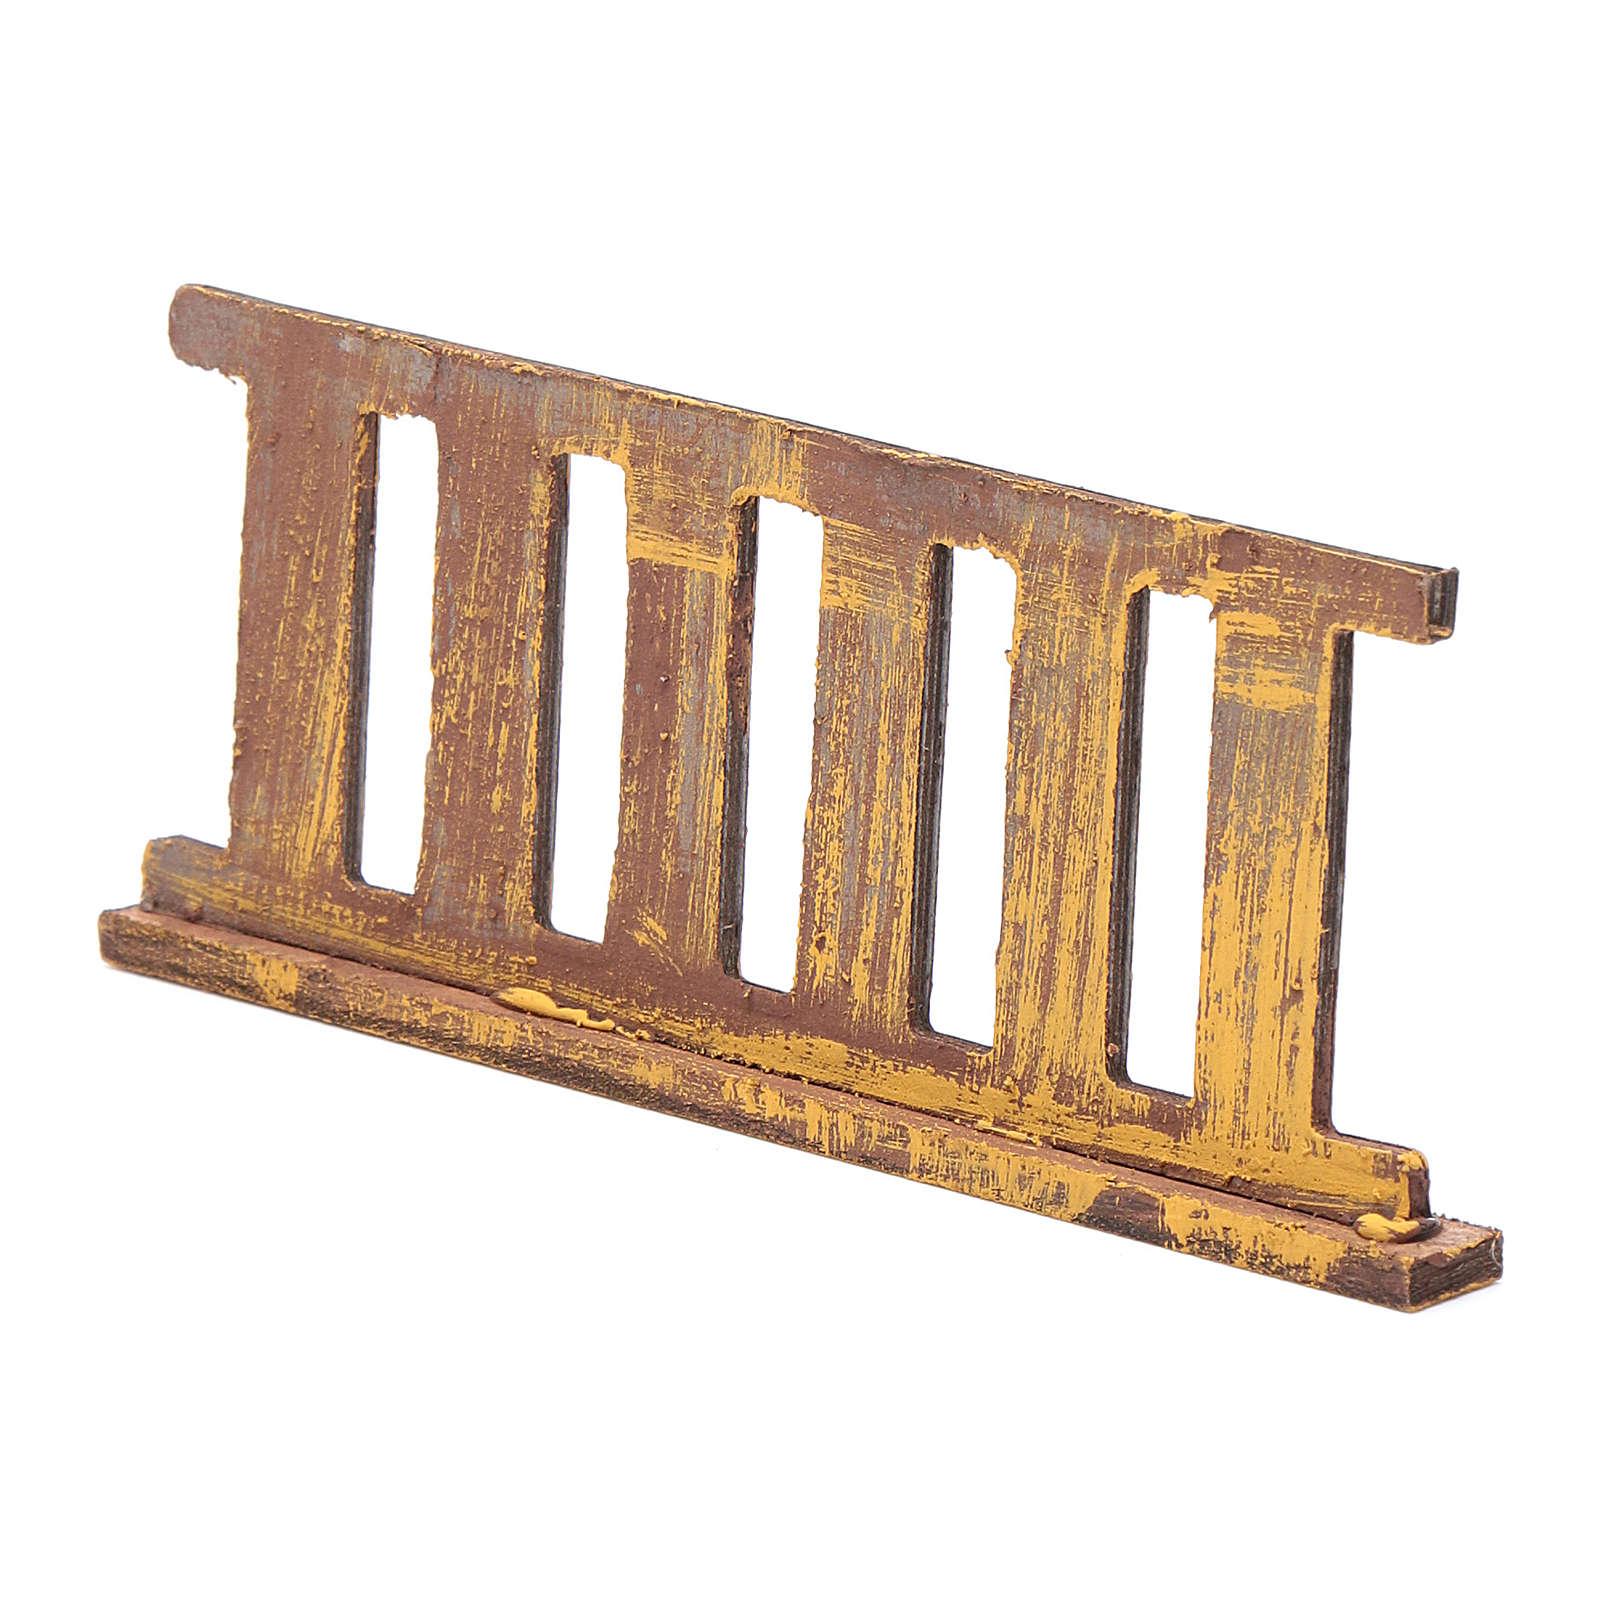 Ringhiera in legno 10x5 cm per presepe 4